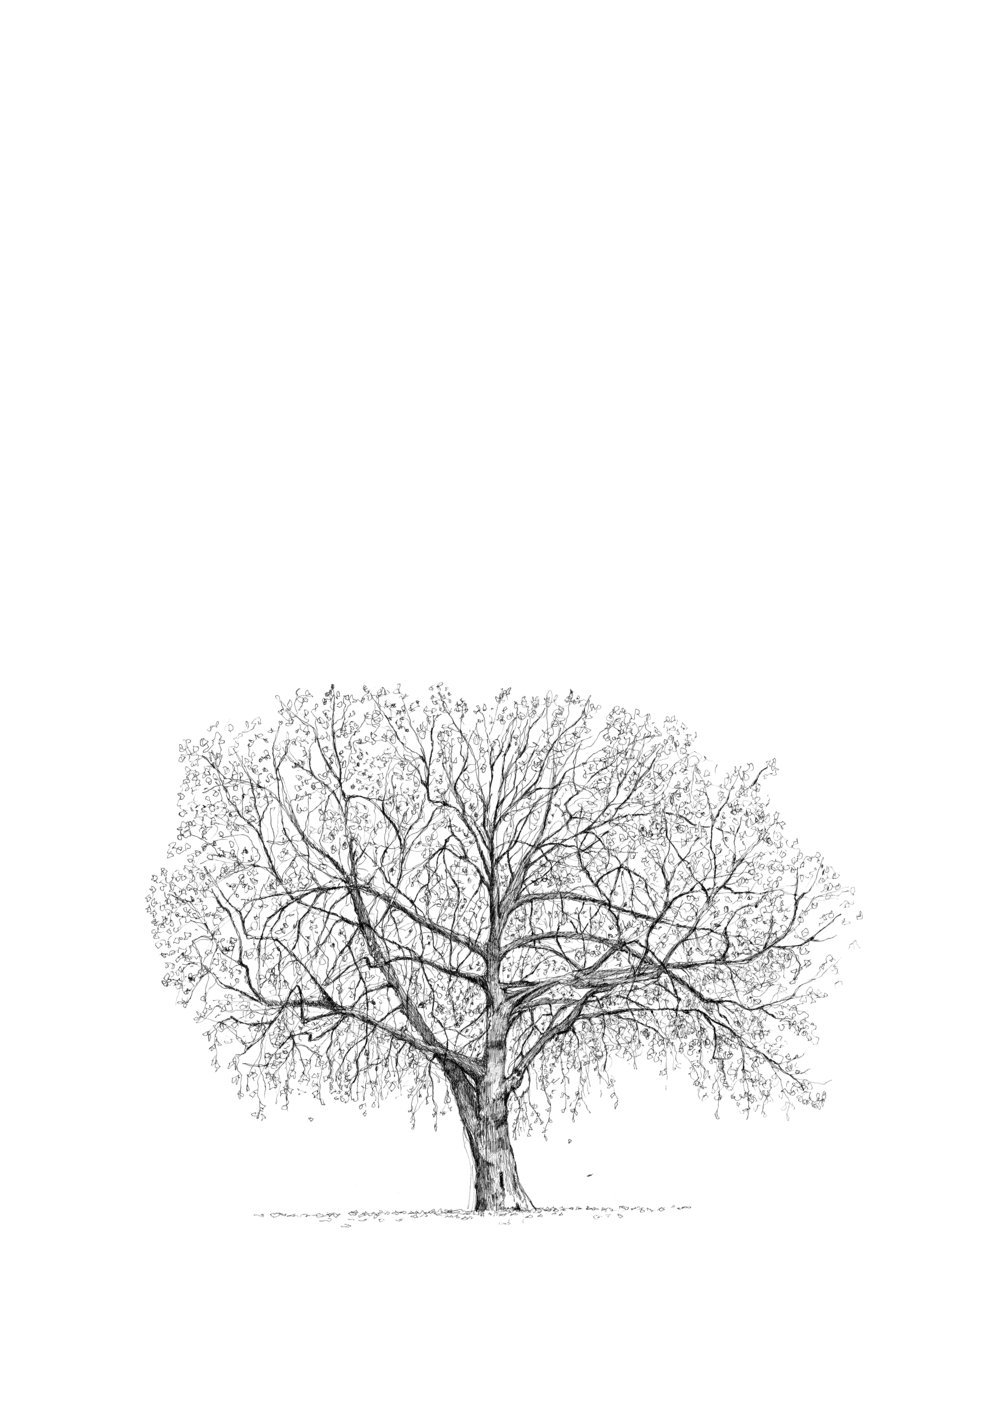 Deans Yard Plane tree